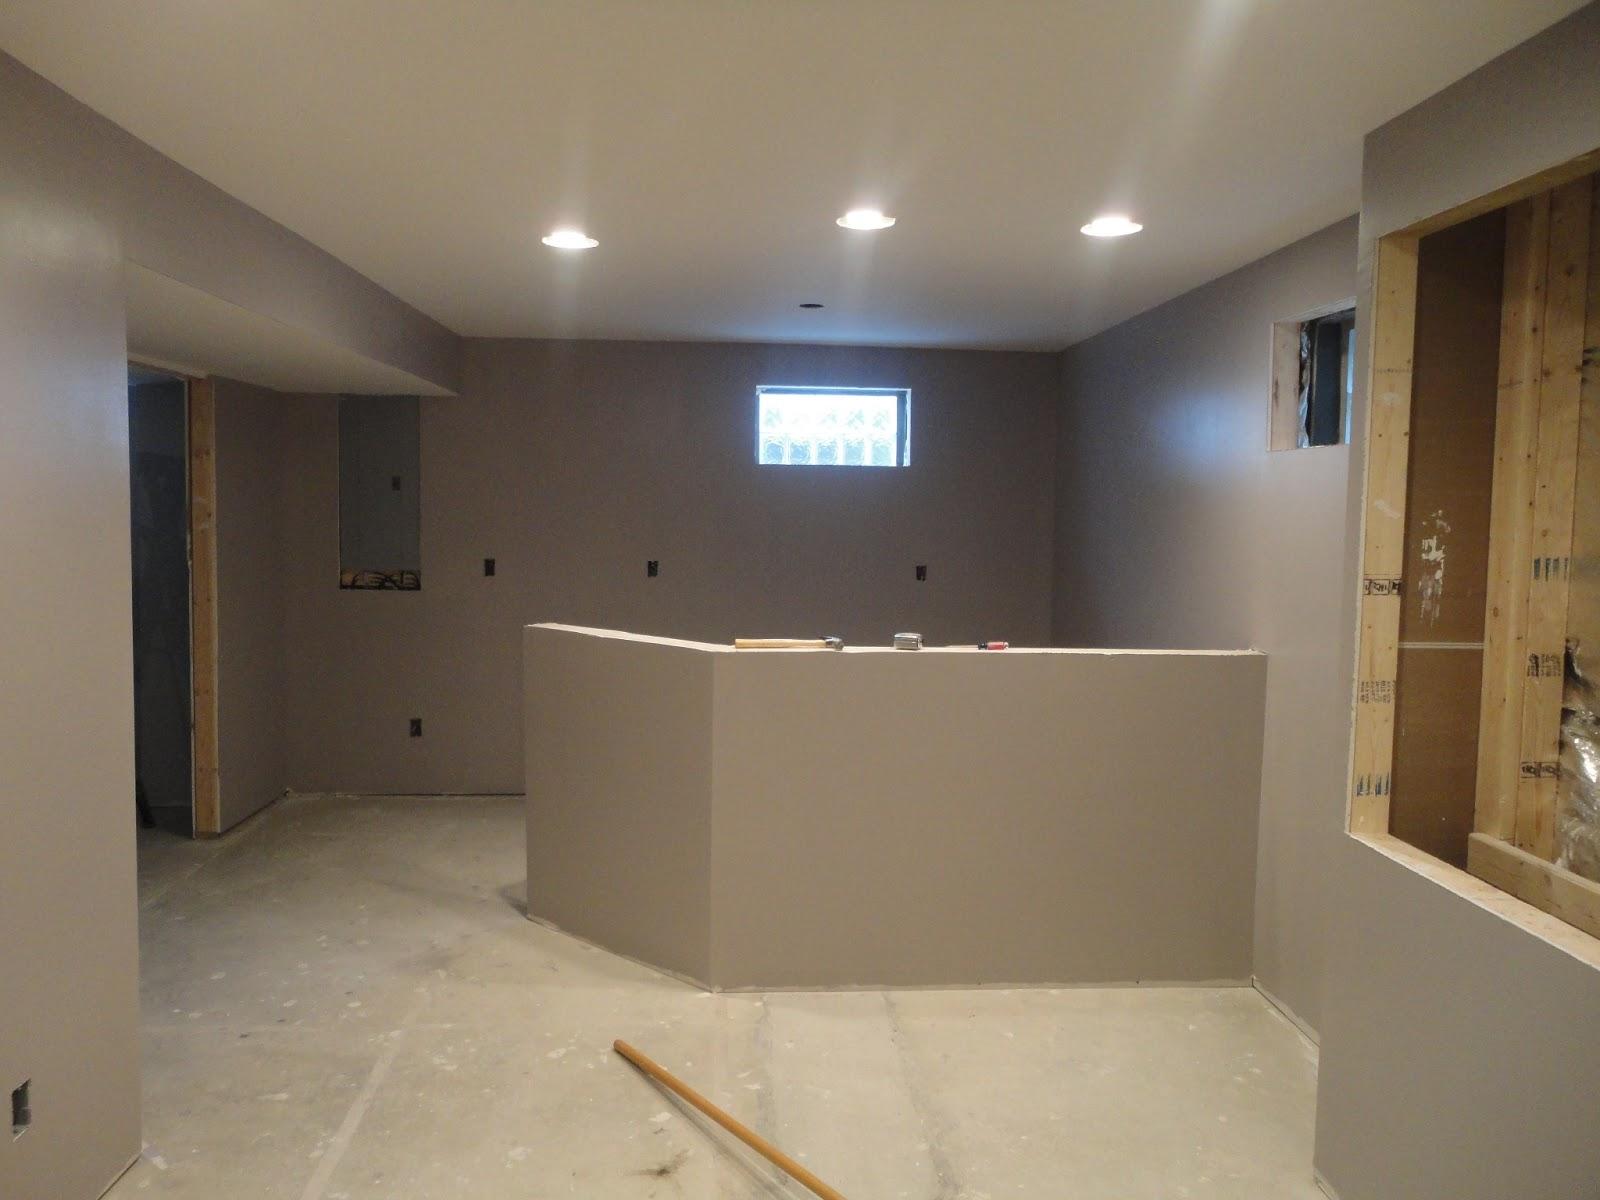 Life After I Do Basement Renovation Paint